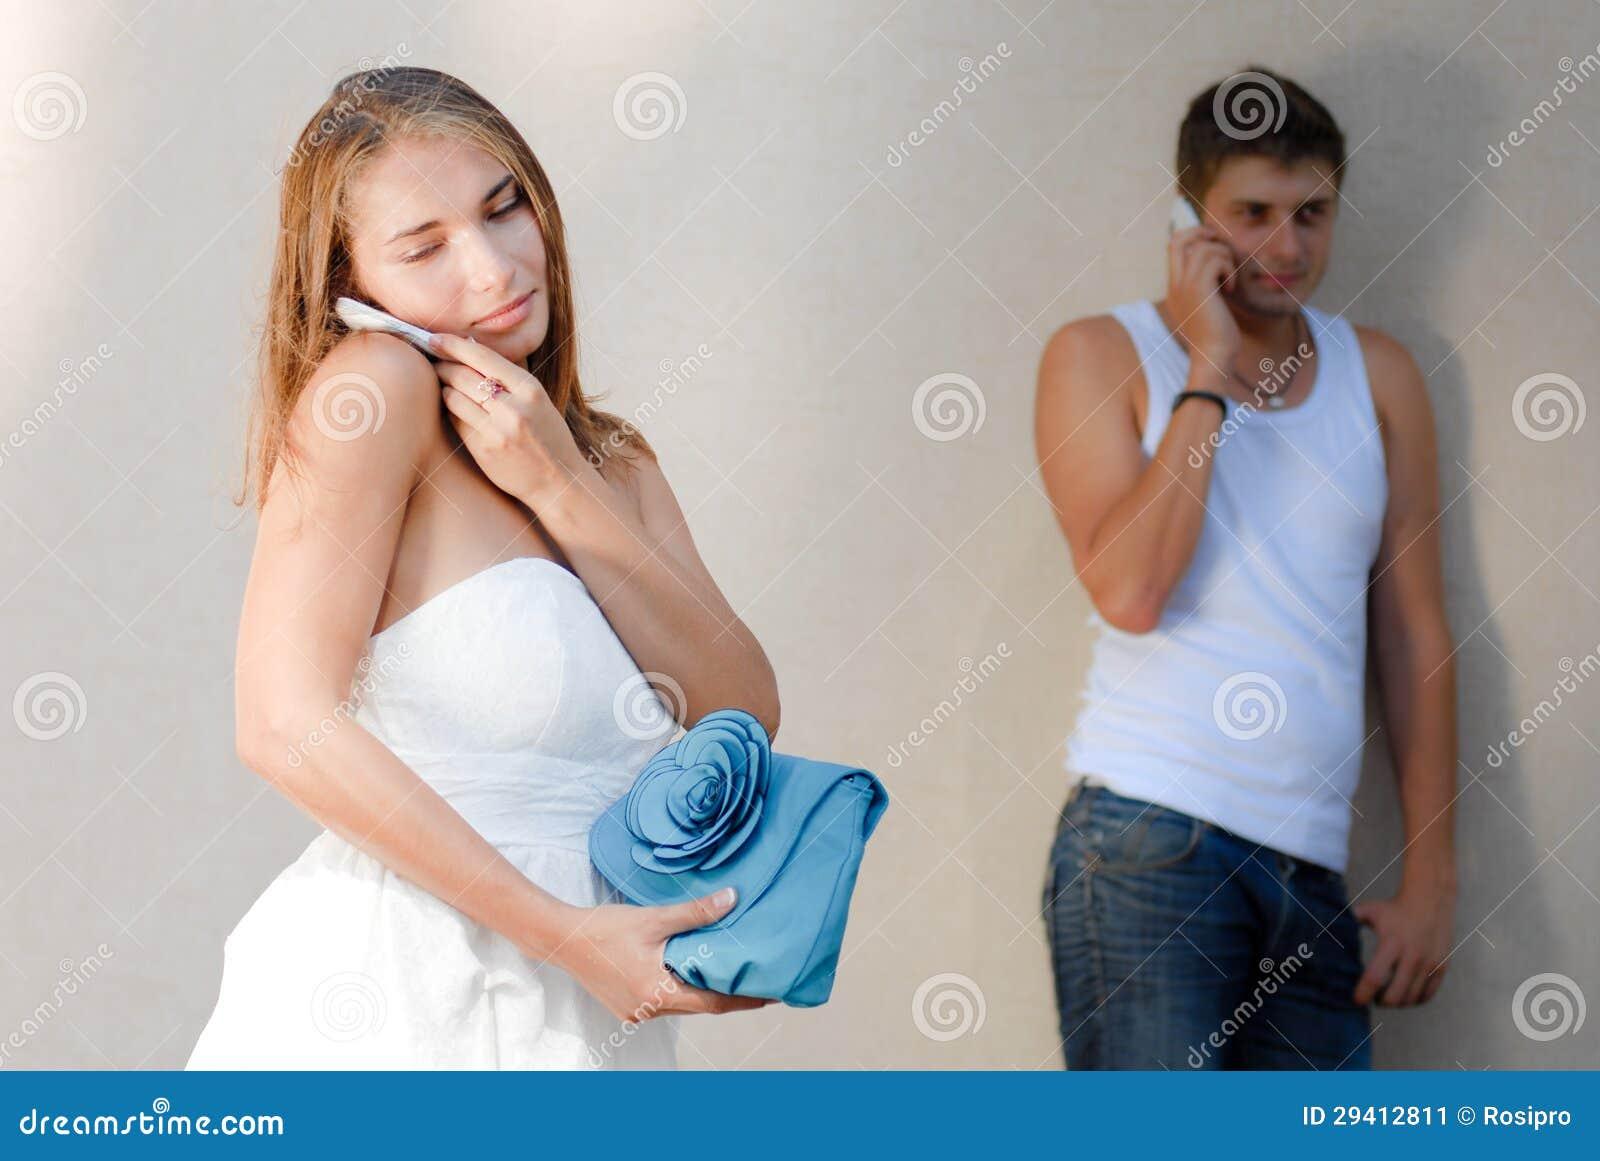 Dating calls